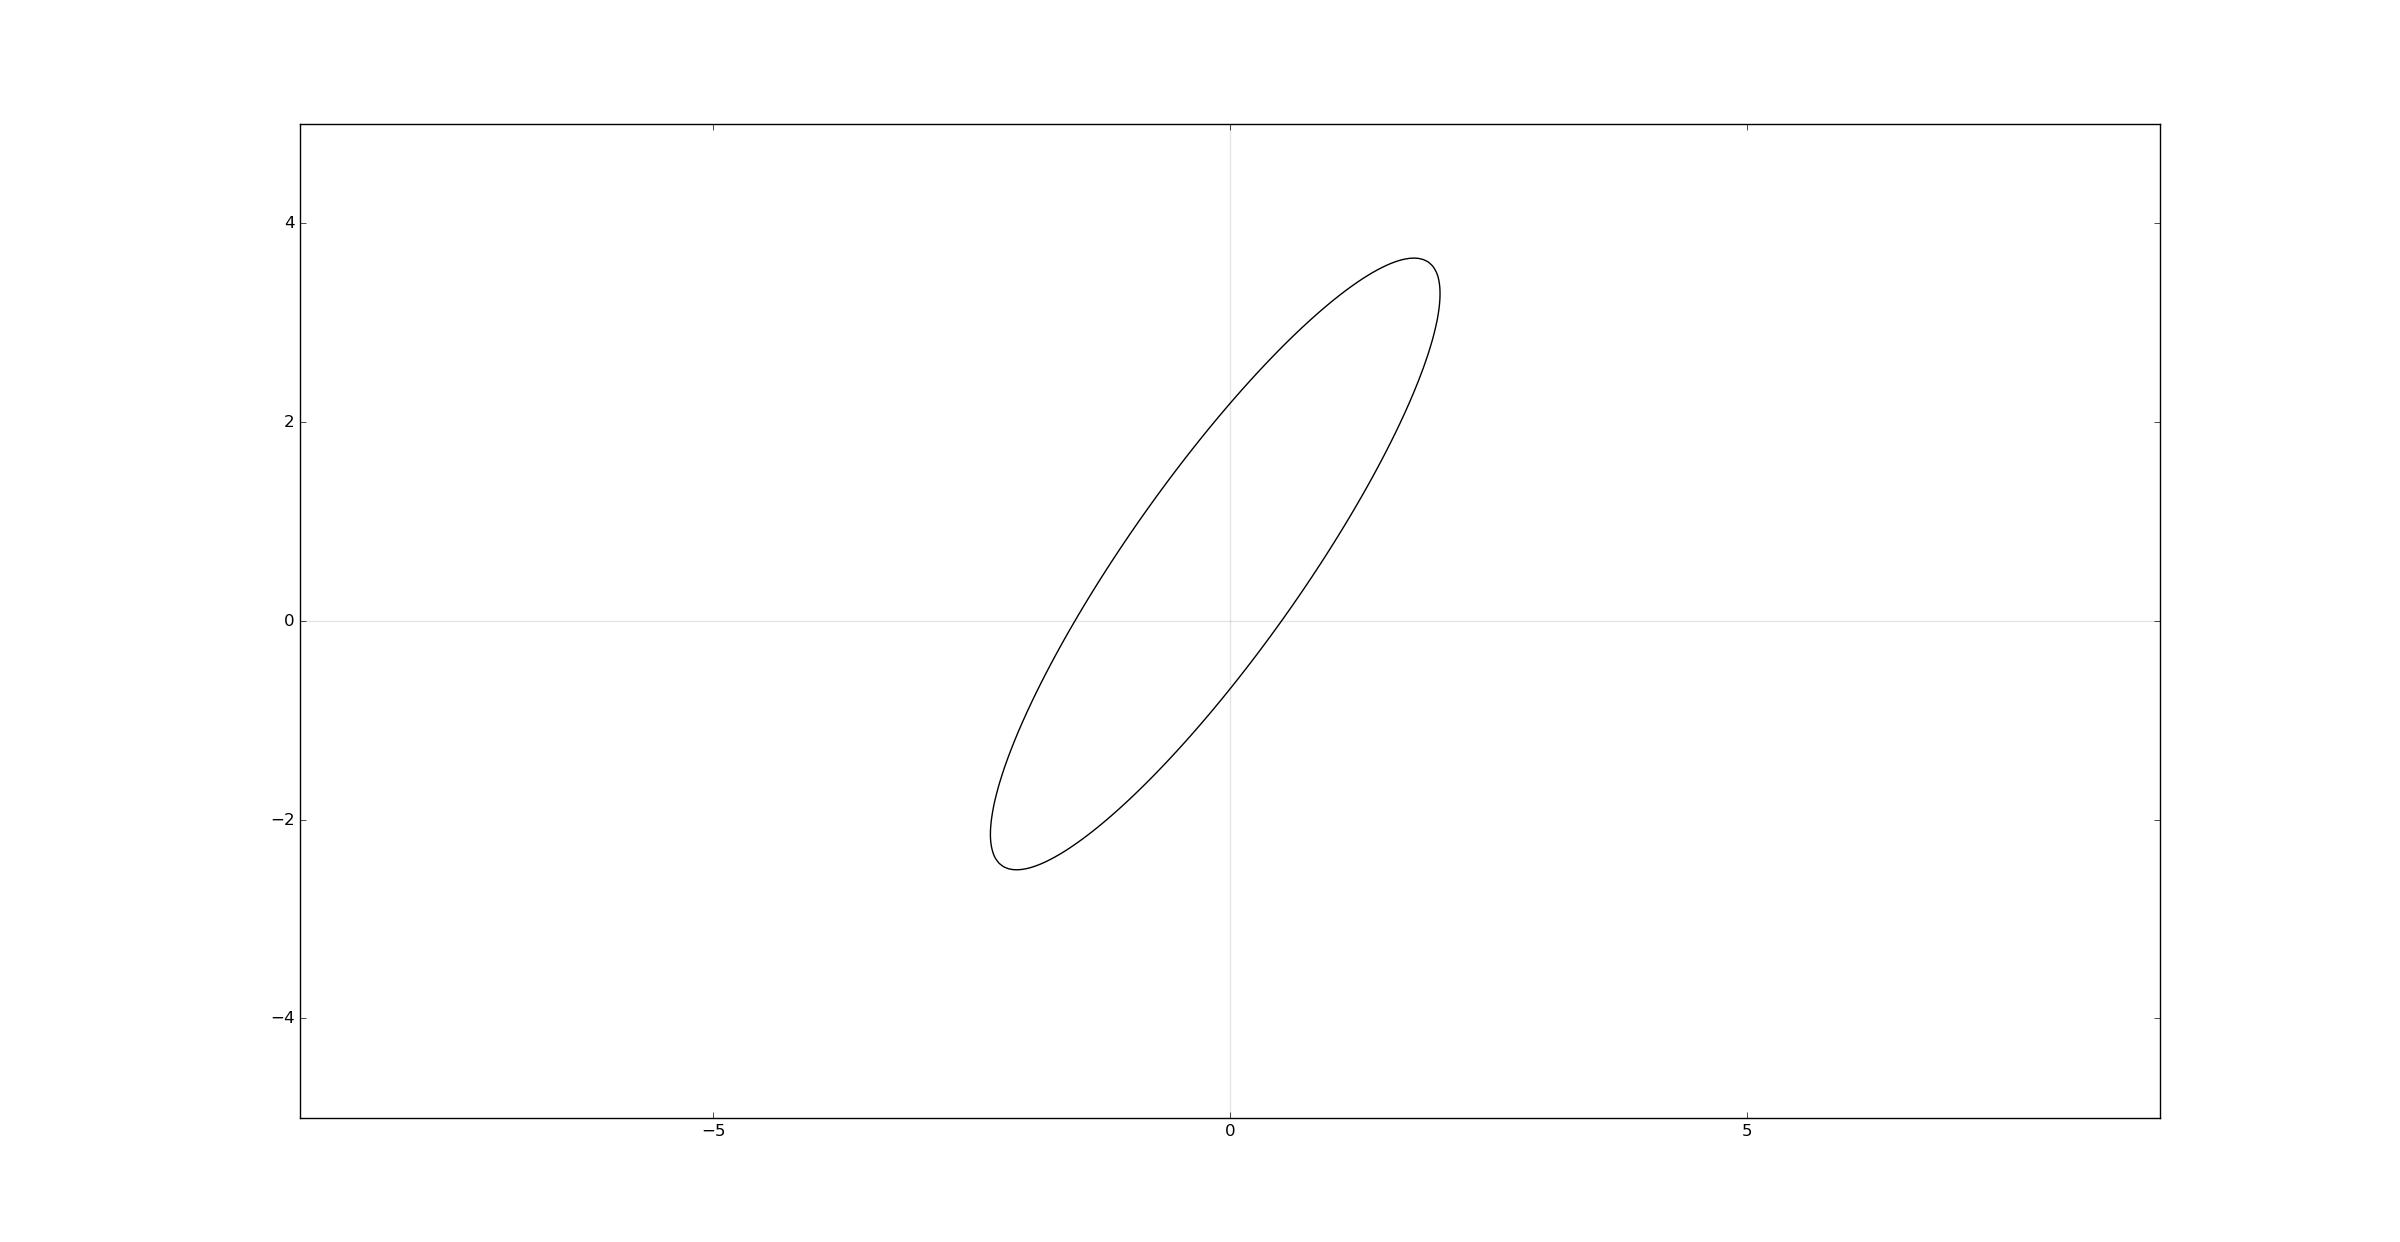 Python Matplotlib ellipse